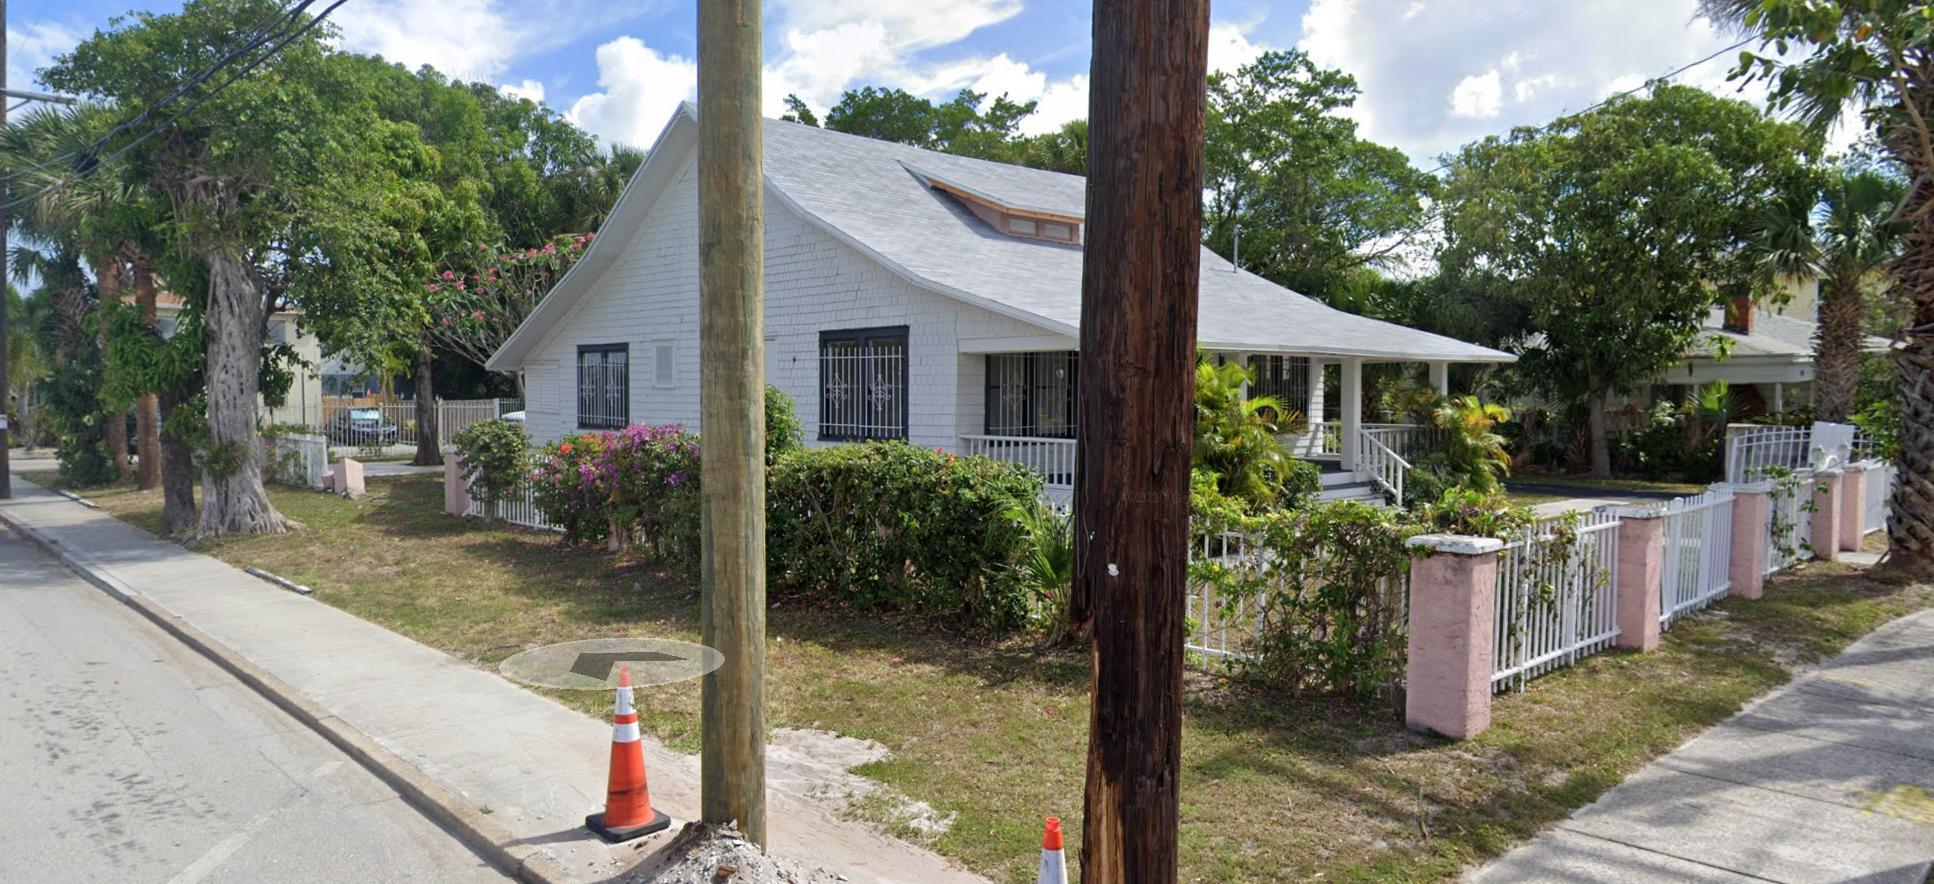 923  3rd Street  For Sale 10735429, FL